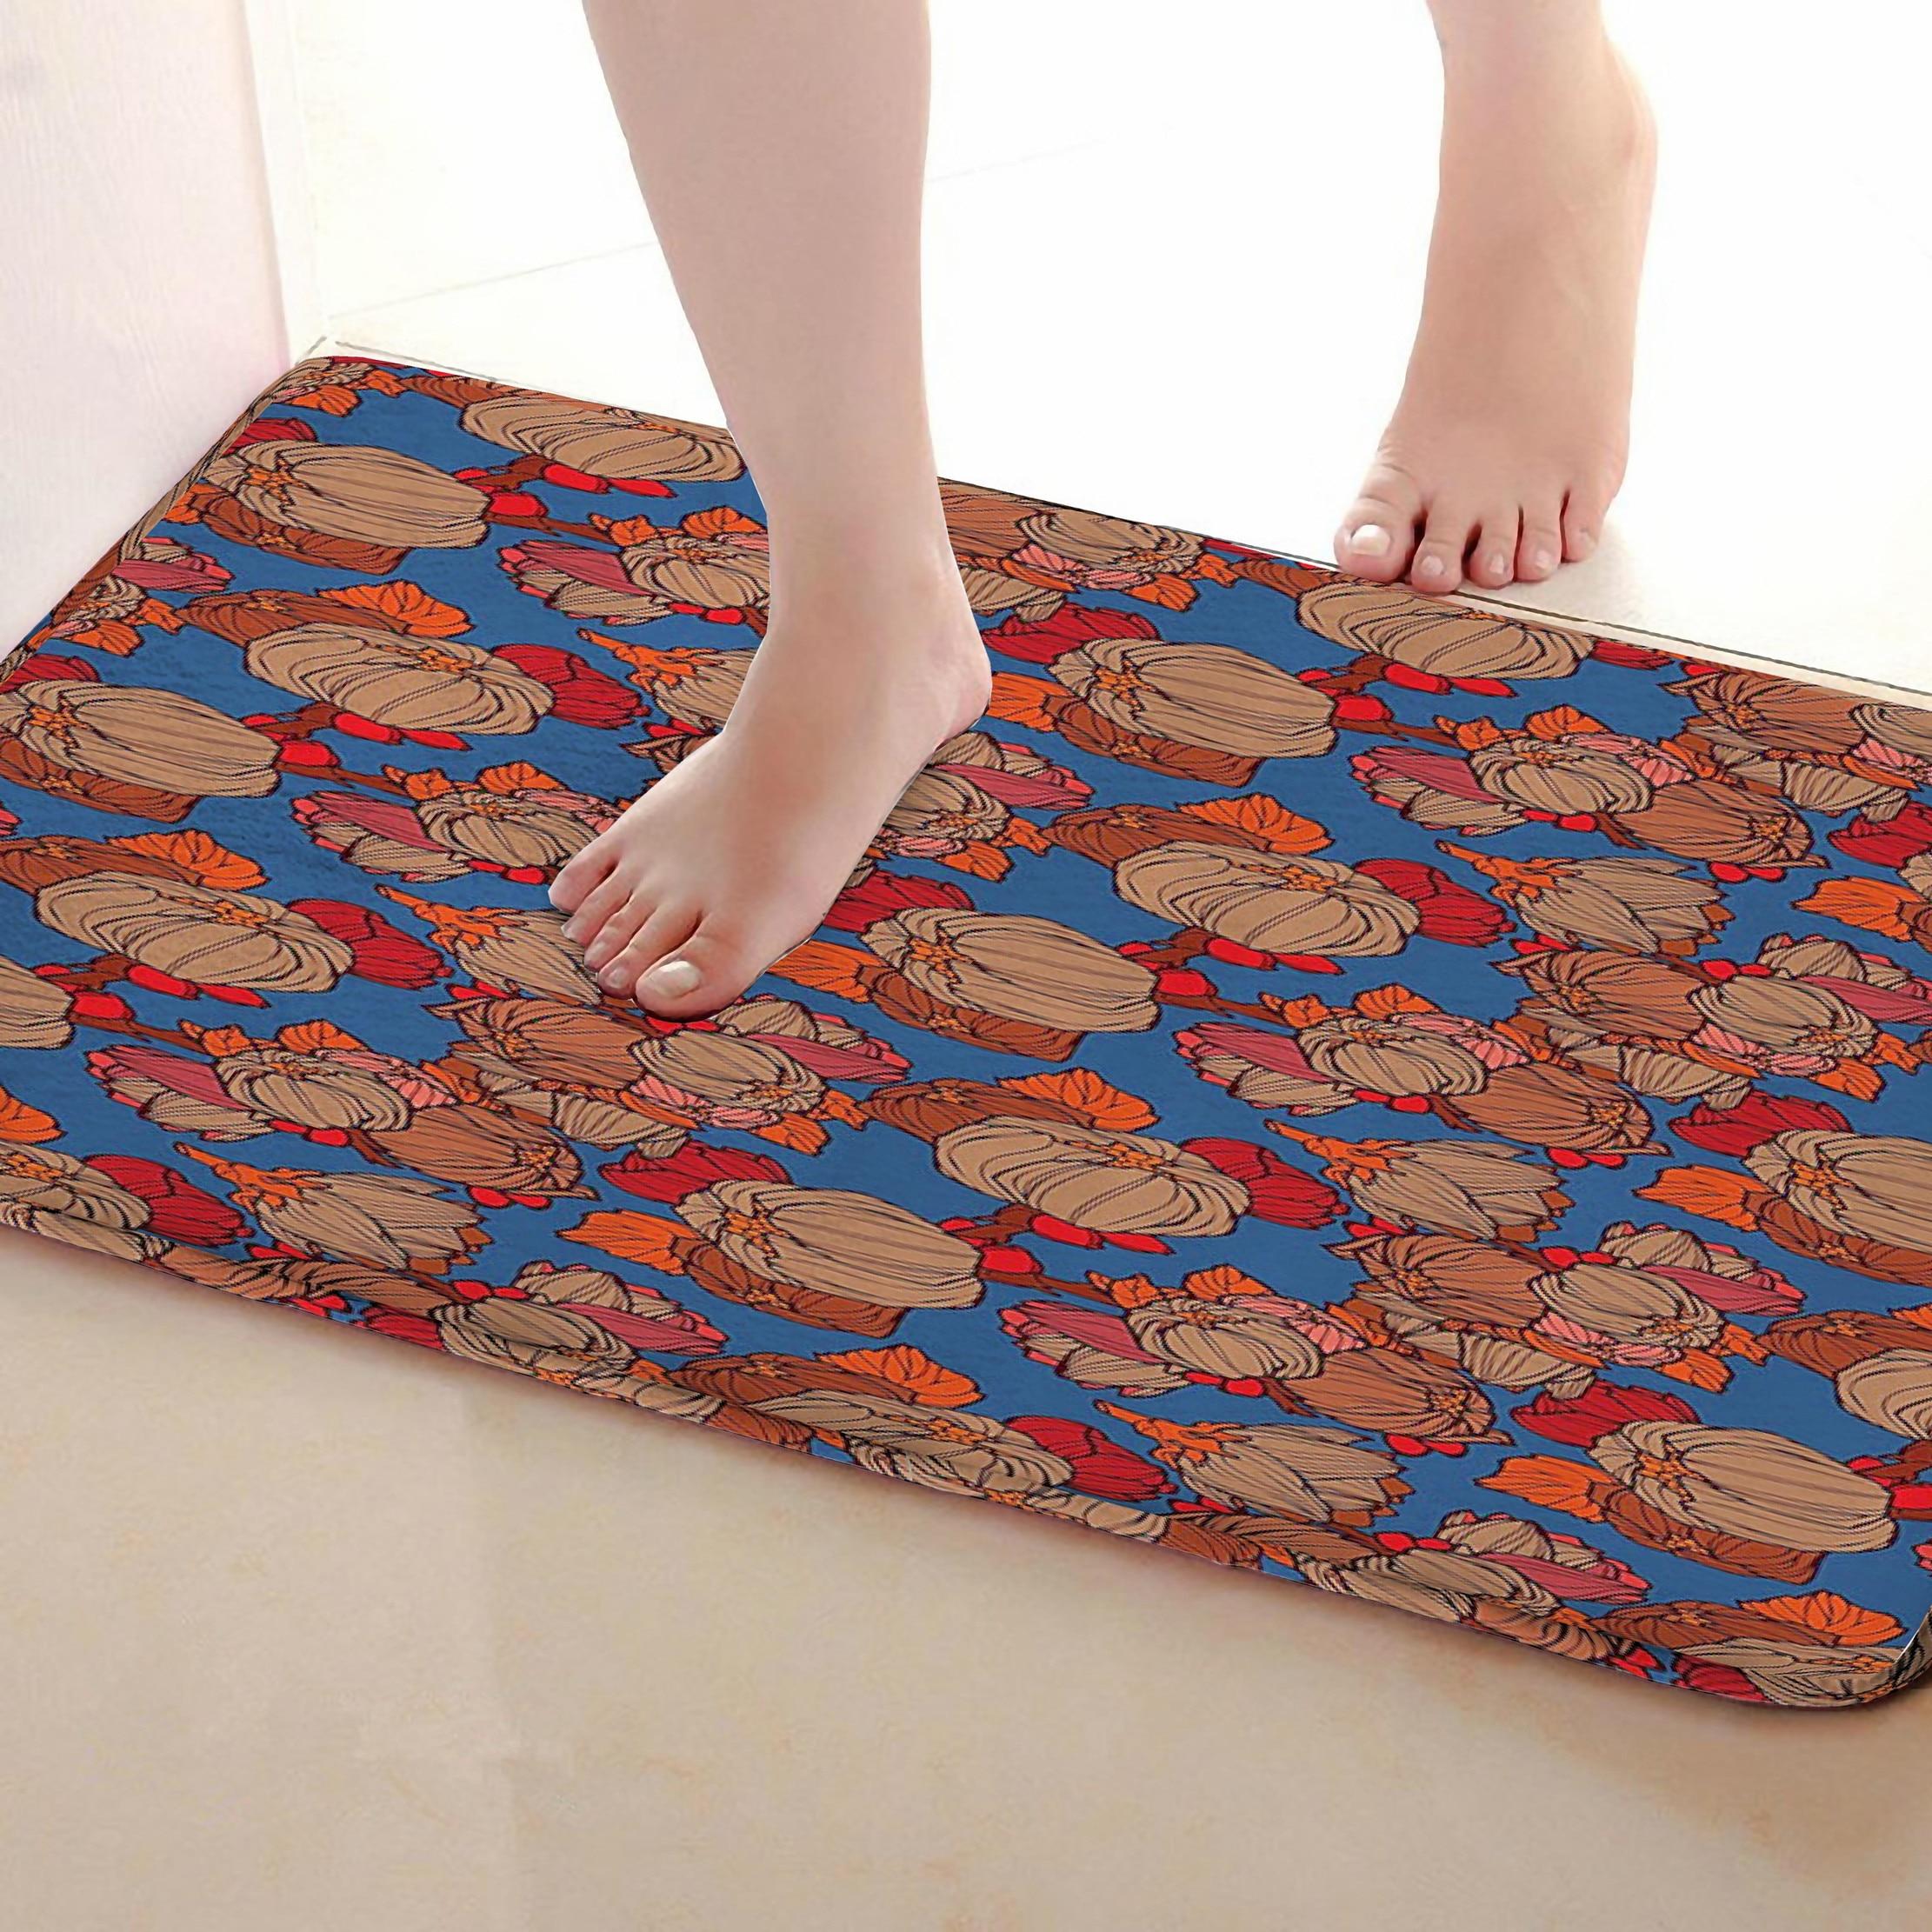 Flower Style Bathroom Mat,Funny Anti Skid Bath Mat,Shower ...